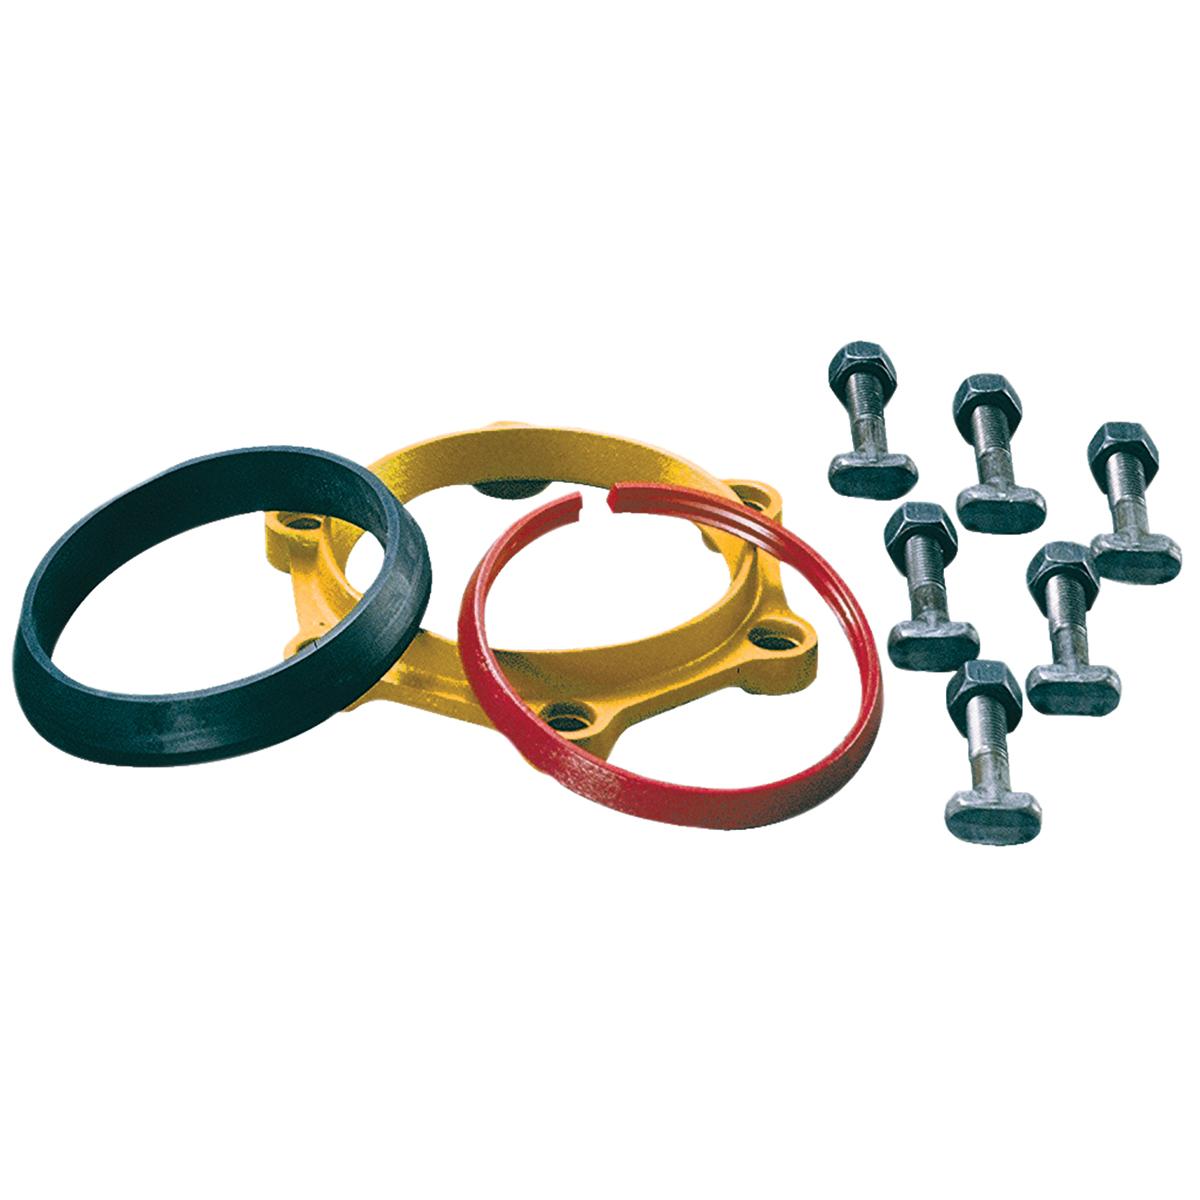 GRIPRING - Full circumferential pipe restraint